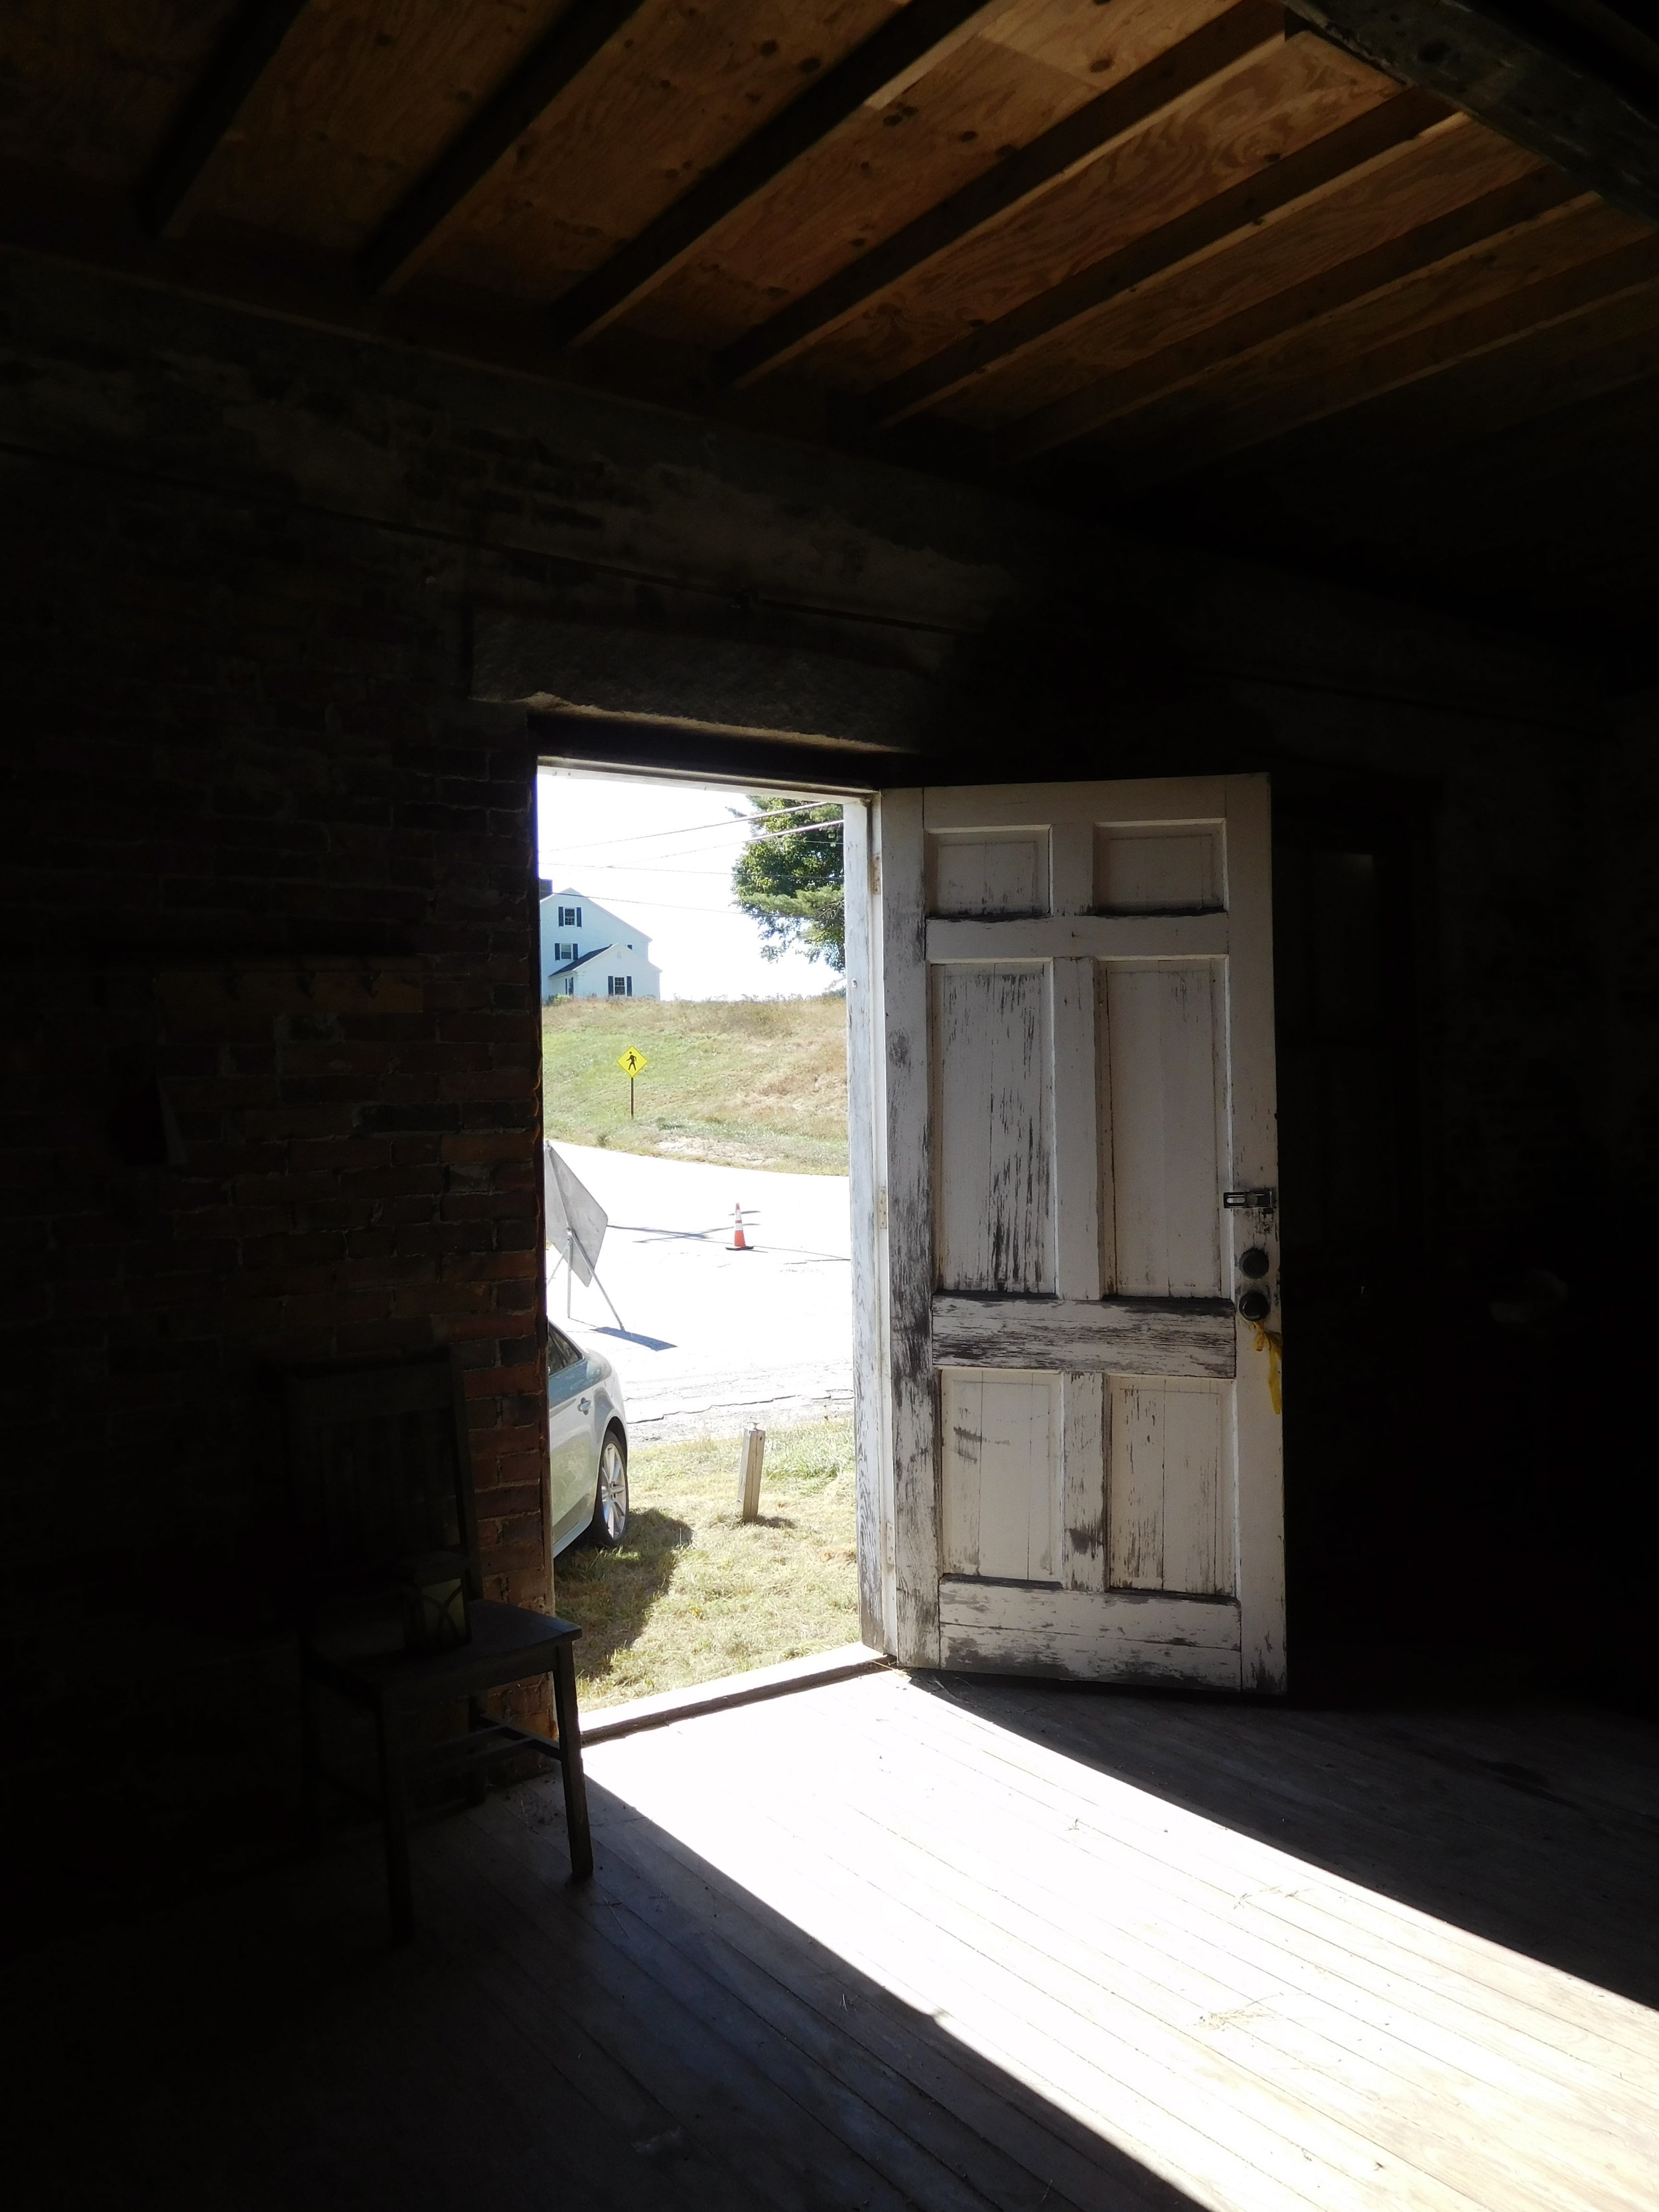 Cumberland_Winn Road School_interior 4_09272016.jpg